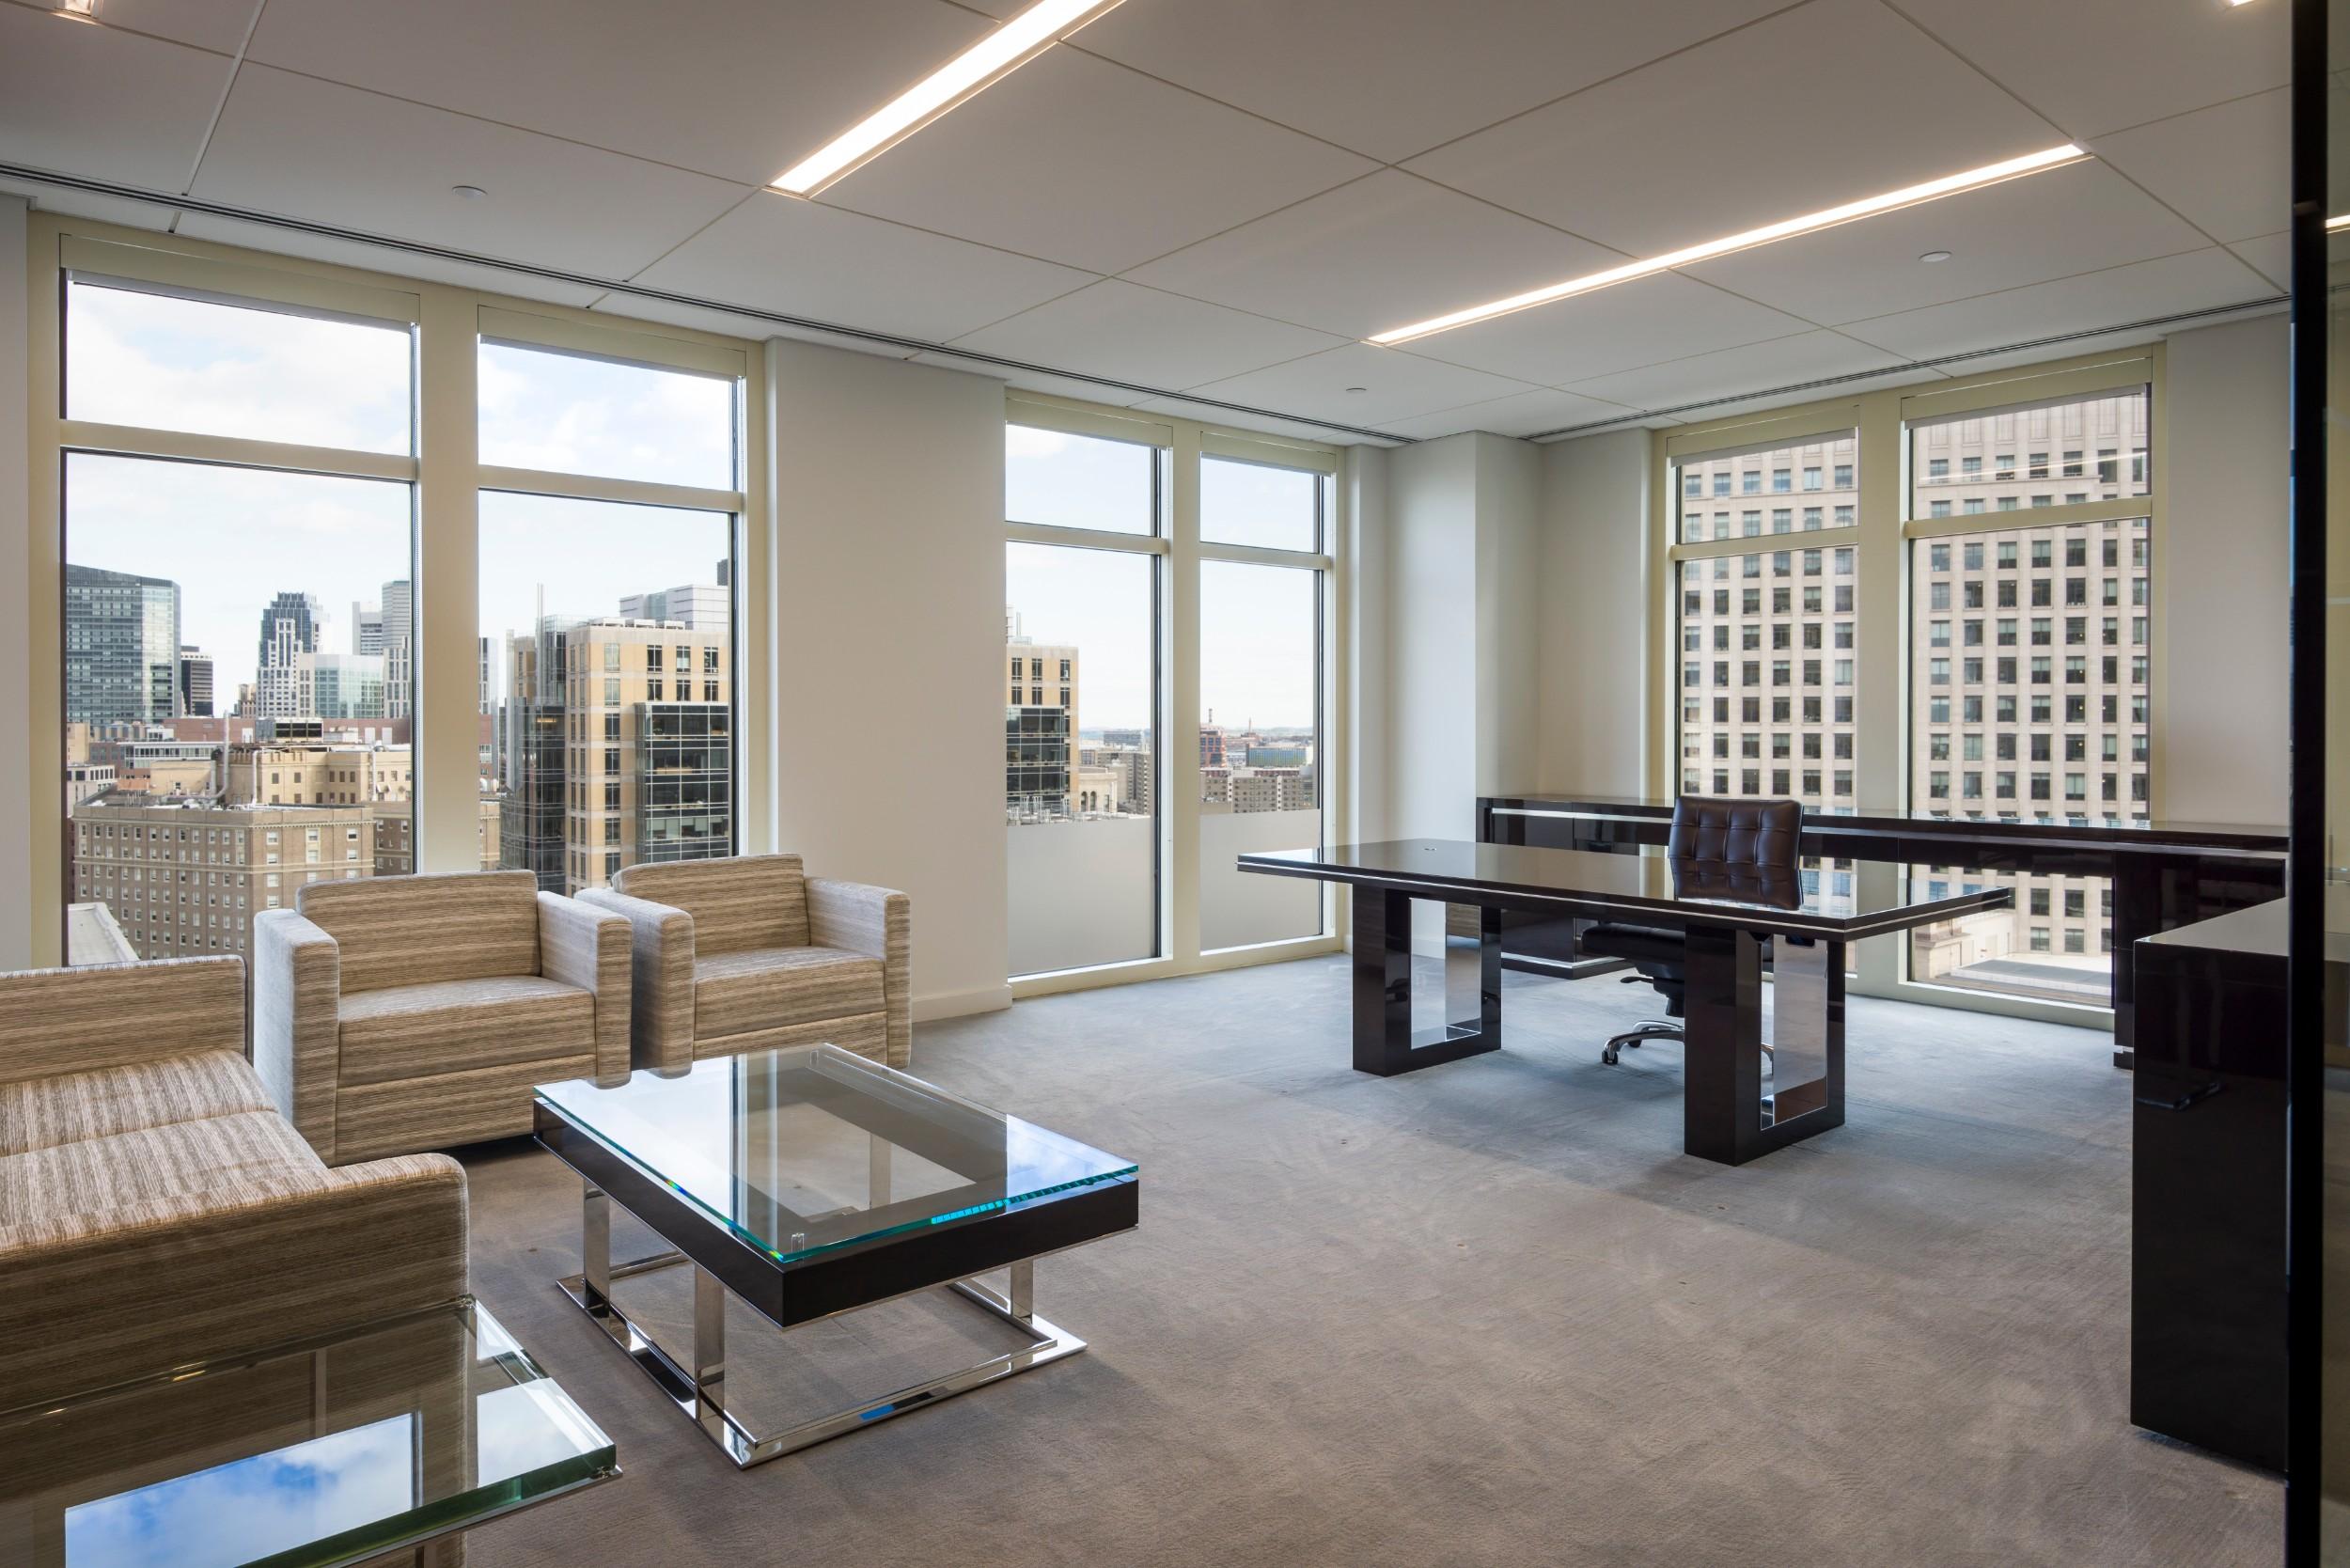 Corderman_Construction_Martignetti_Companies_Interior_Office_Buildout_Large_Office.jpg